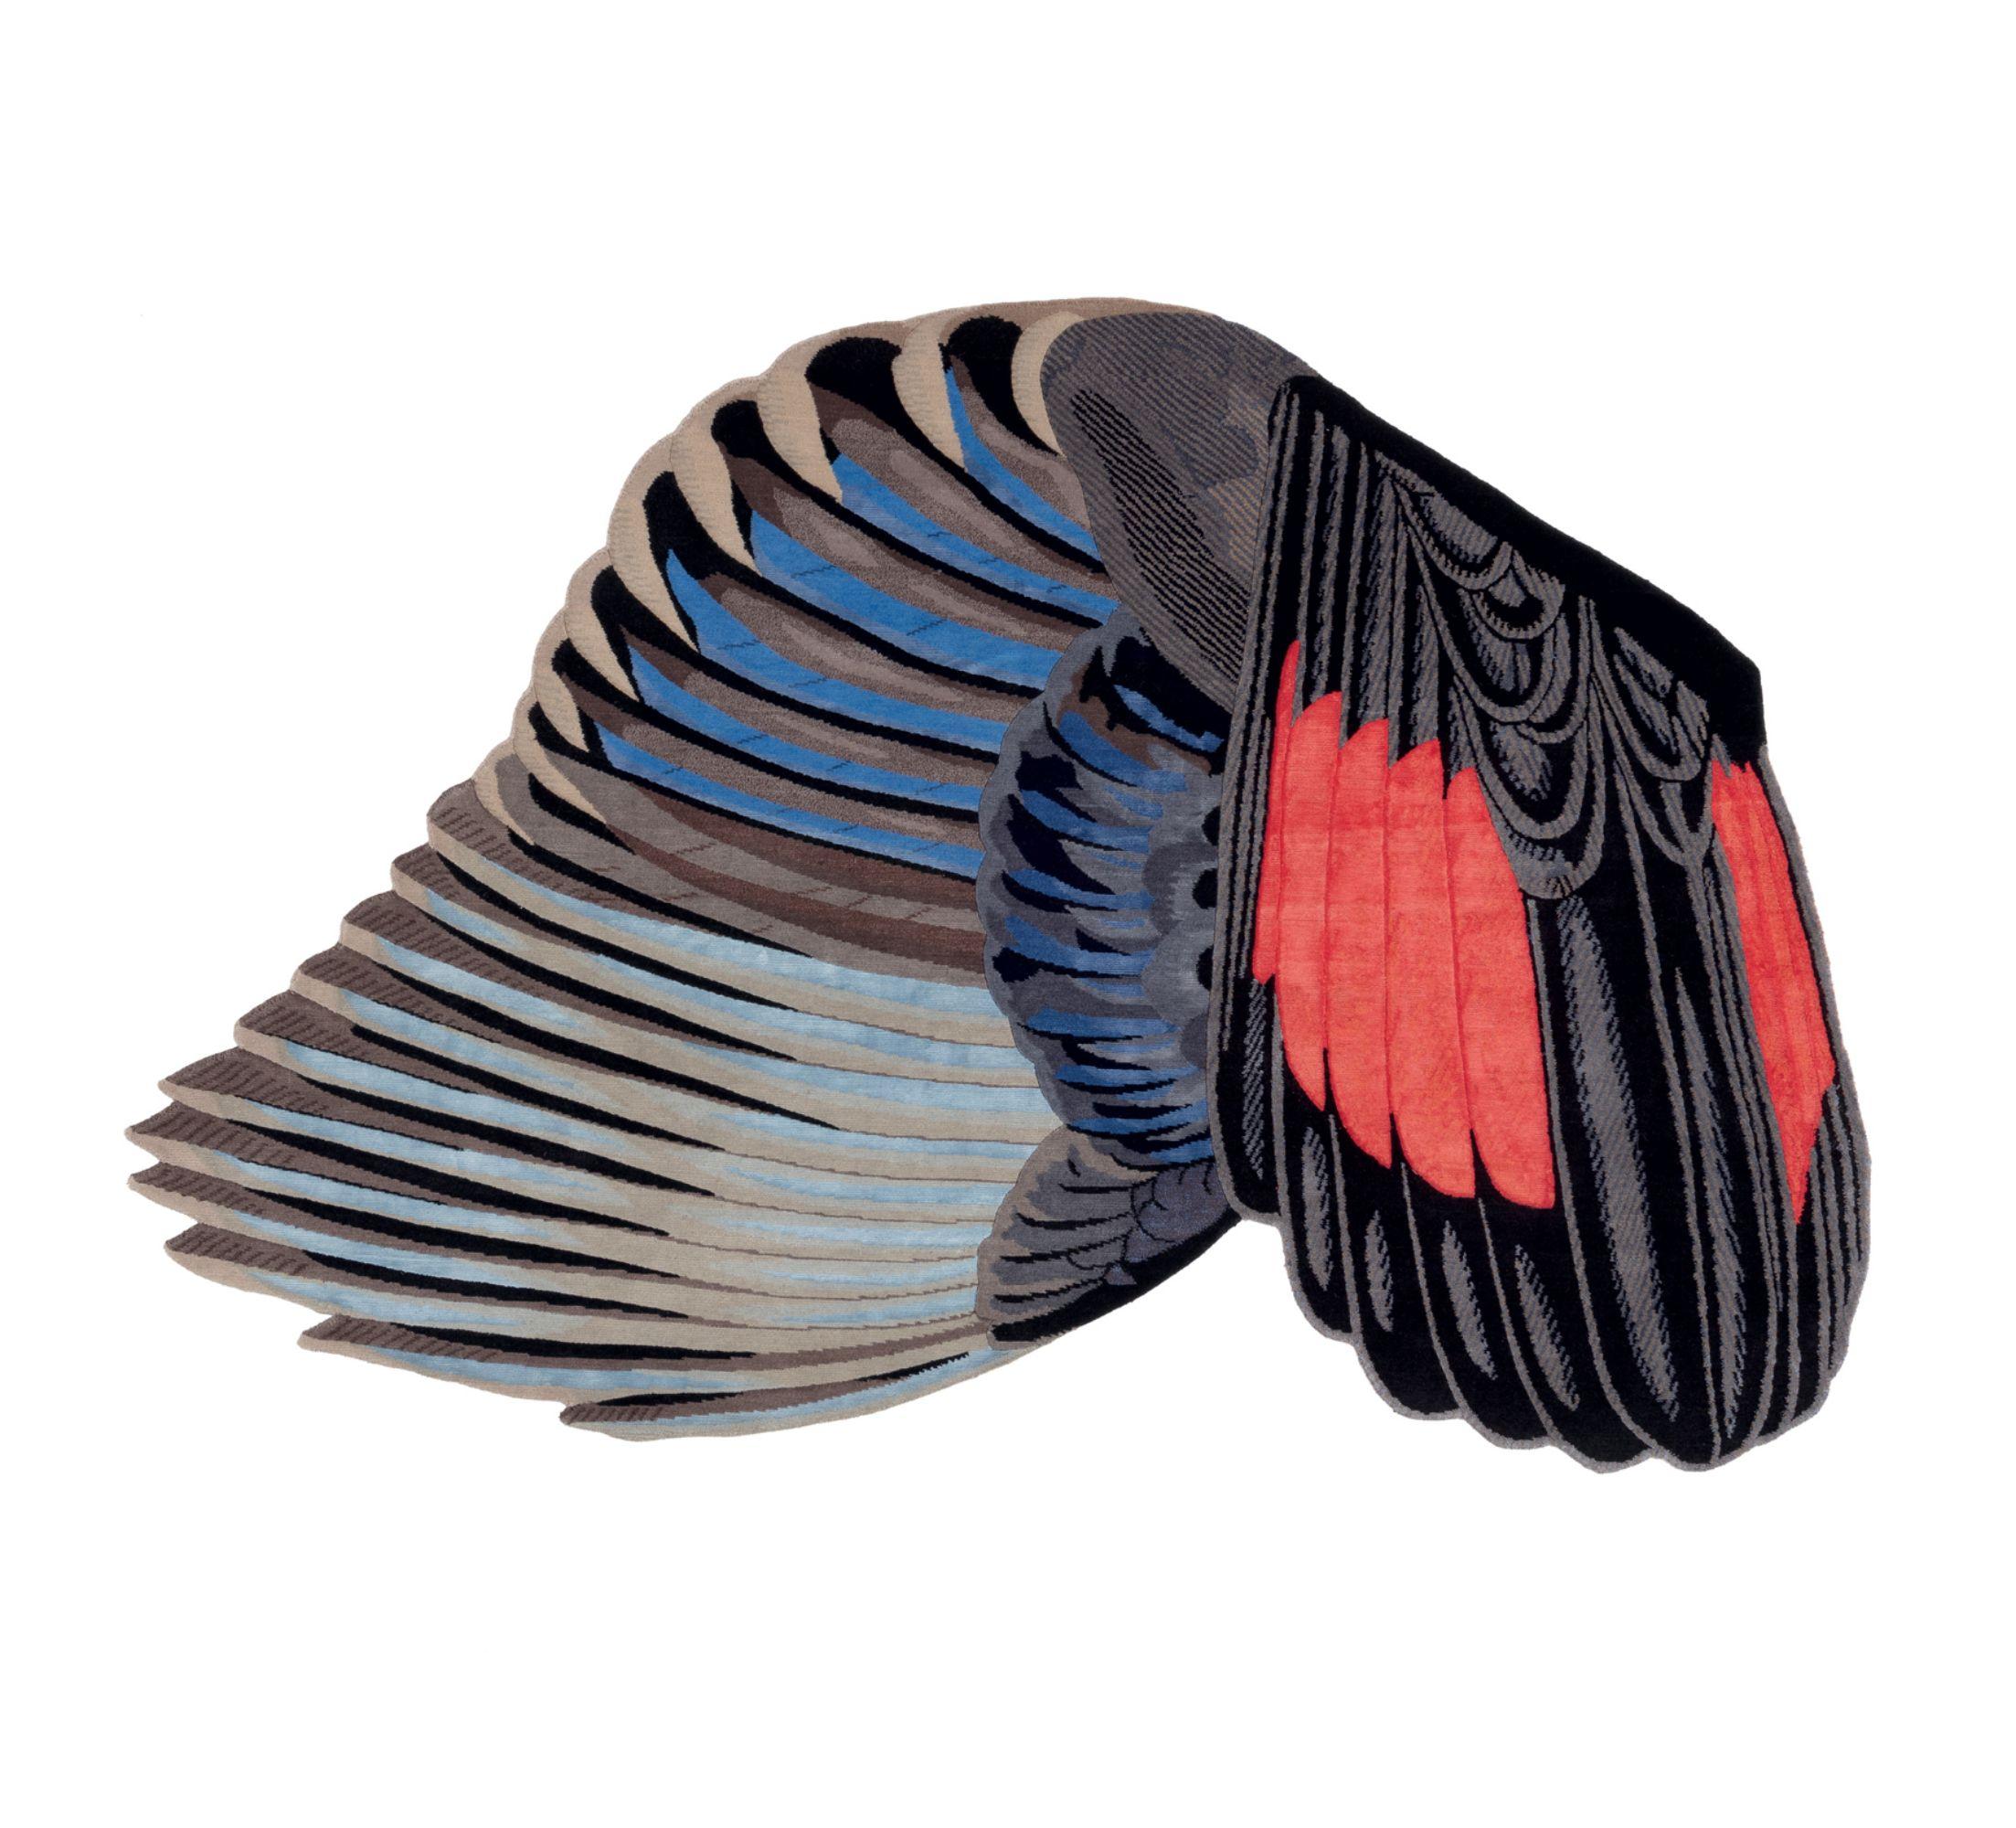 Feathers Freeform